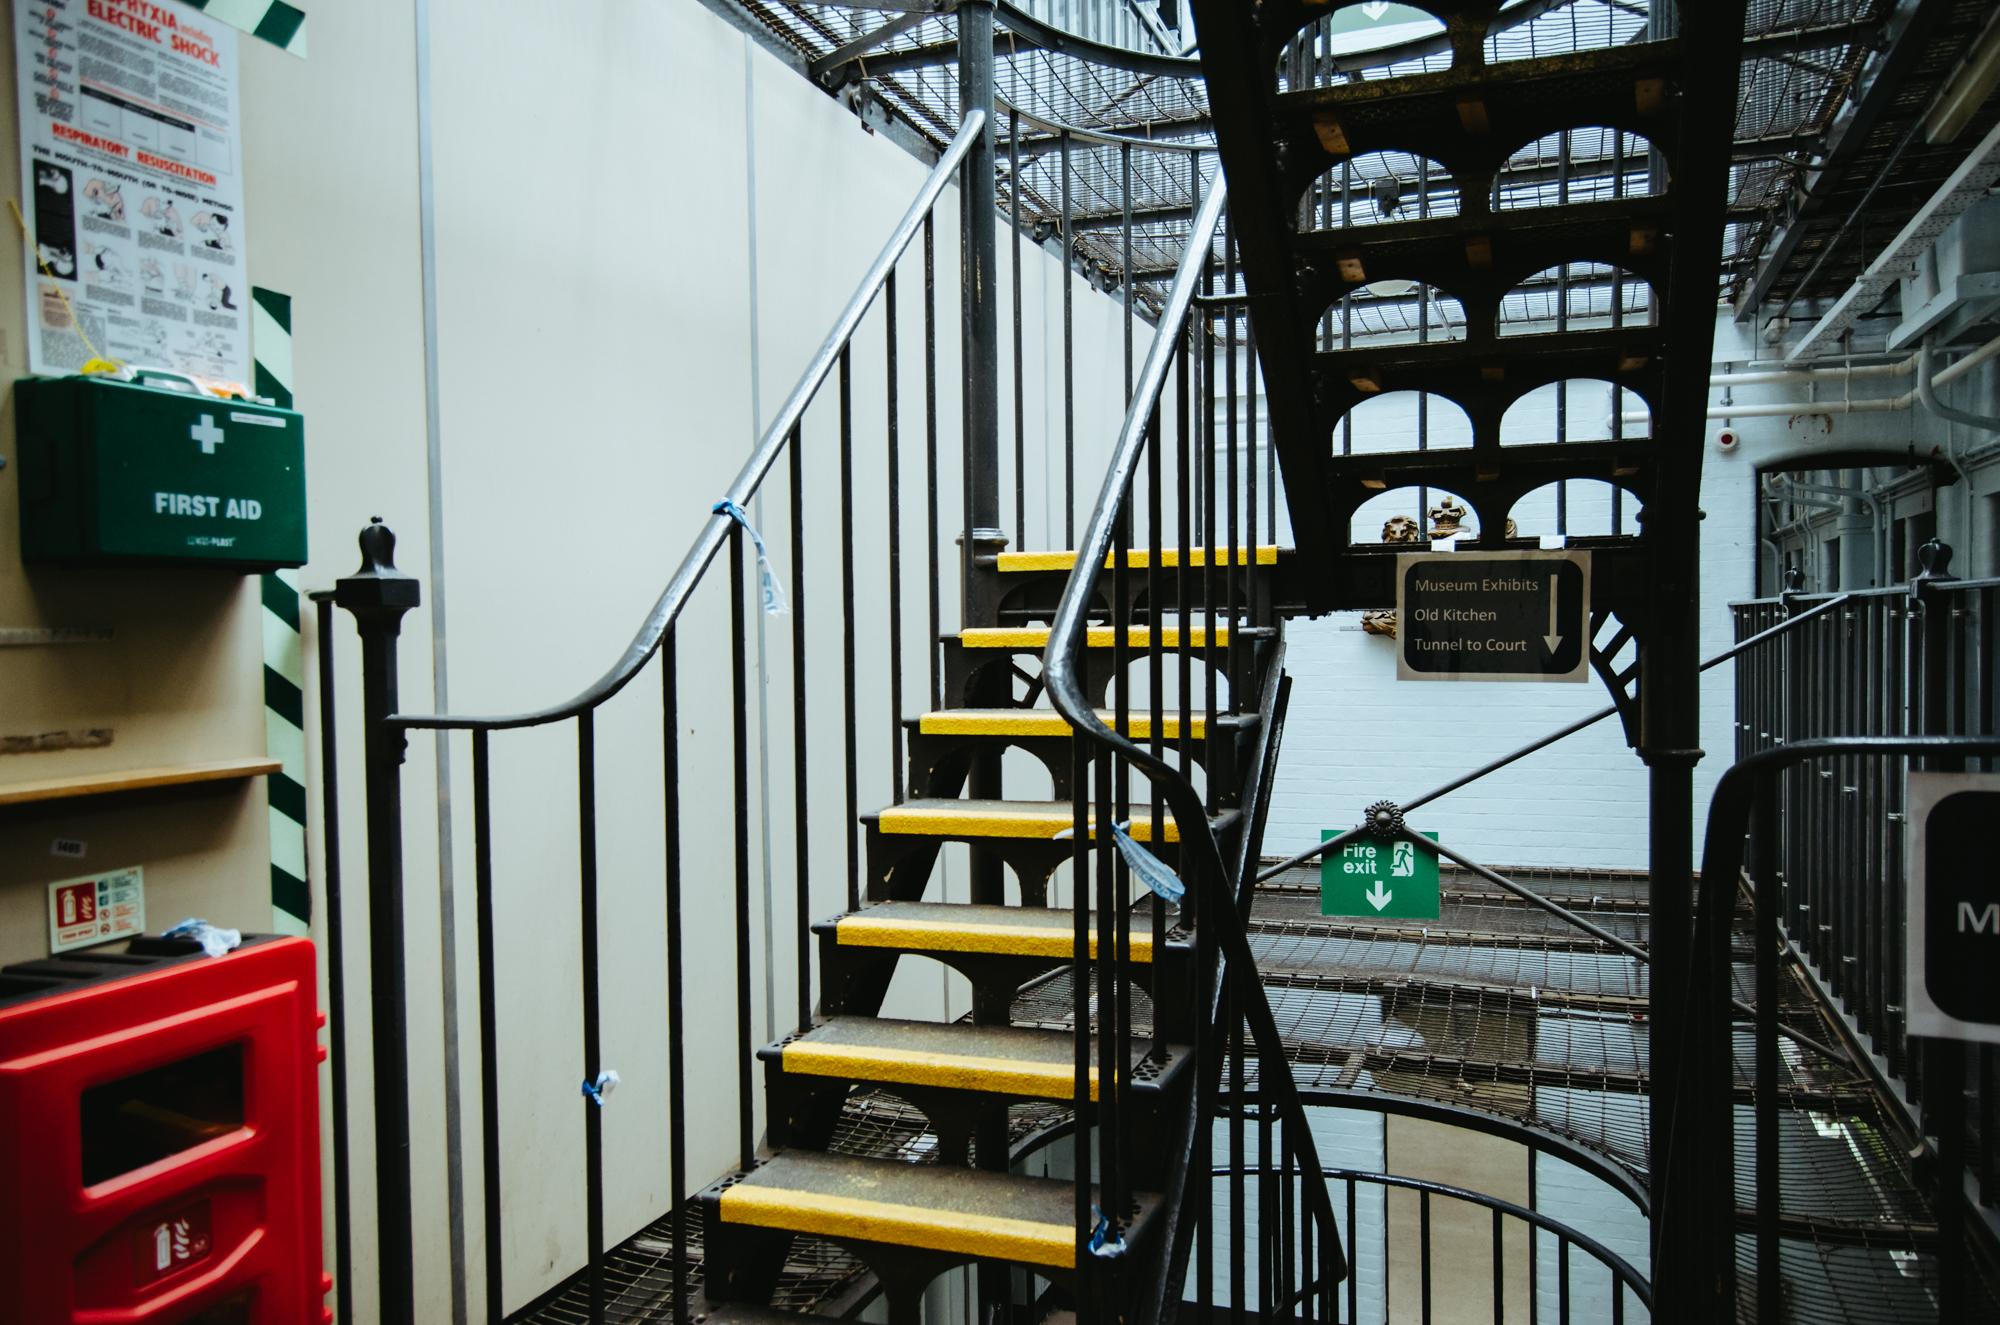 Steelhouse-Lane-Lock-Up-Birmingham-Hanny-Foxhall-_DSC2543.jpg